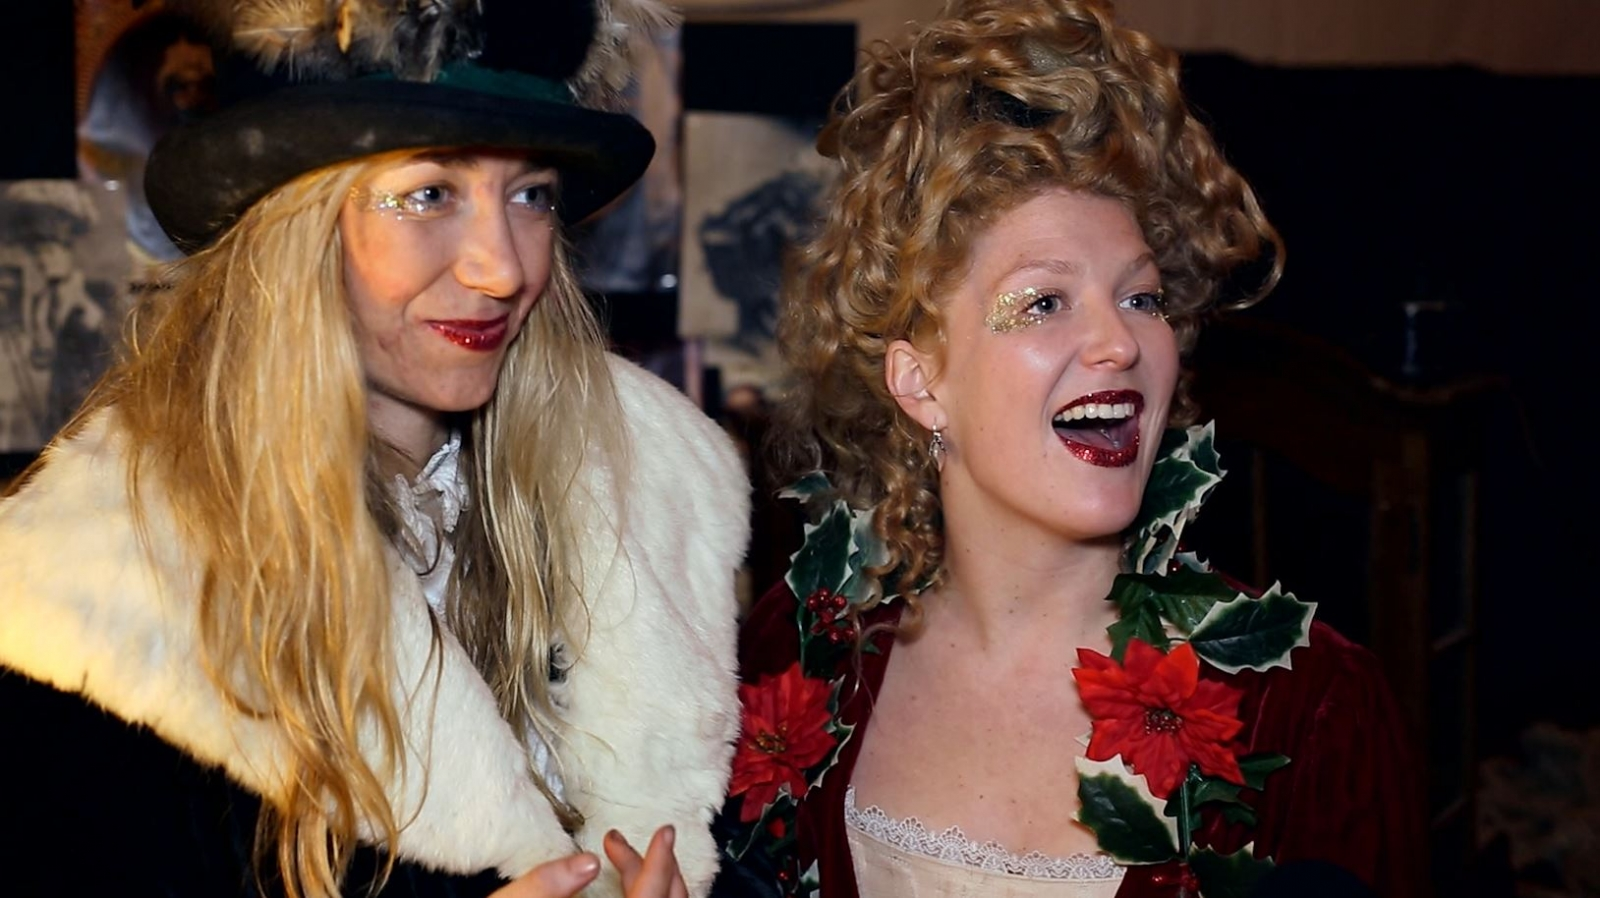 Winterville: London's alternative Christmas festival